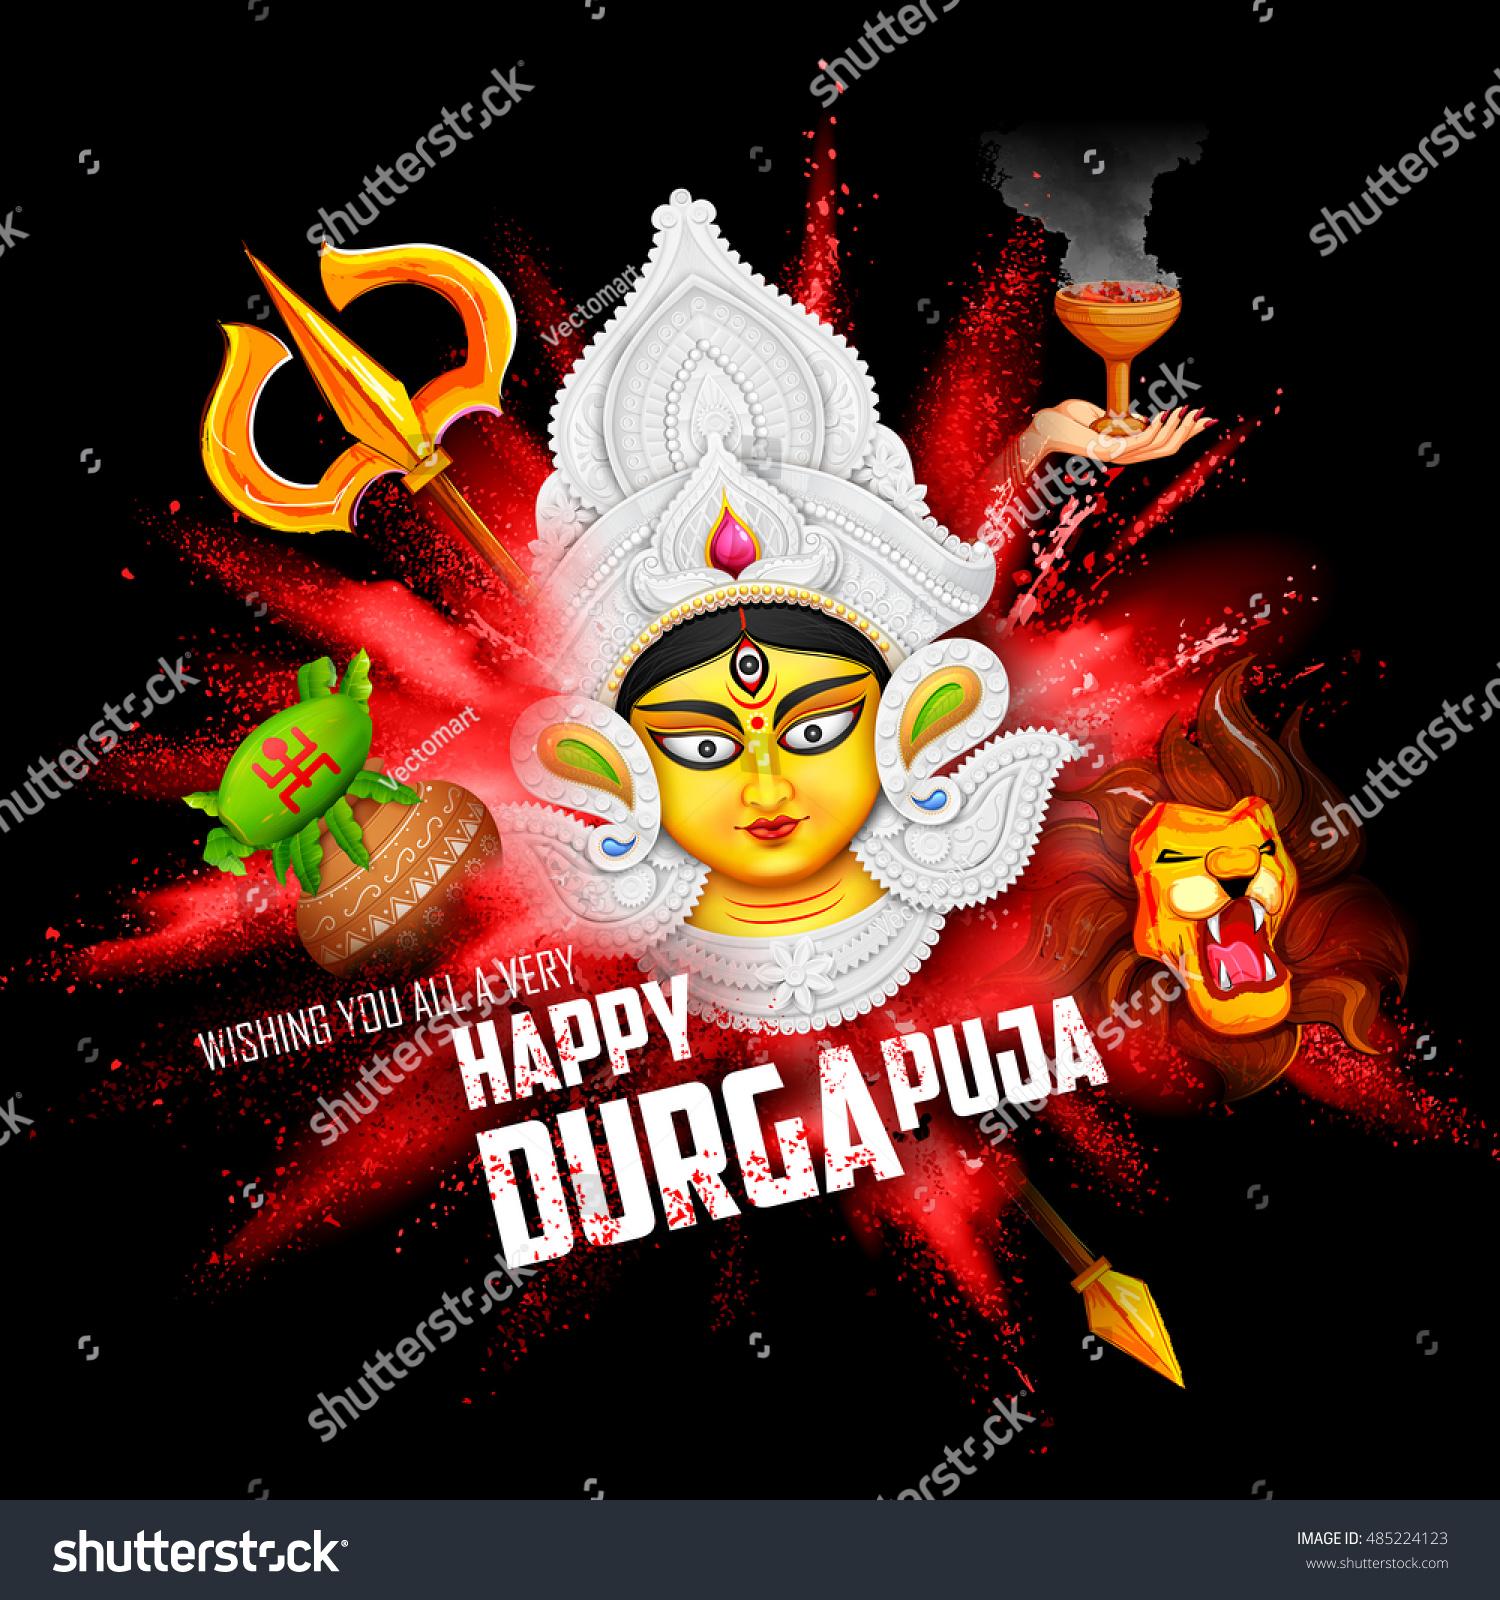 Illustration Goddess Durga Subho Bijoya Happy Stock Vector Royalty